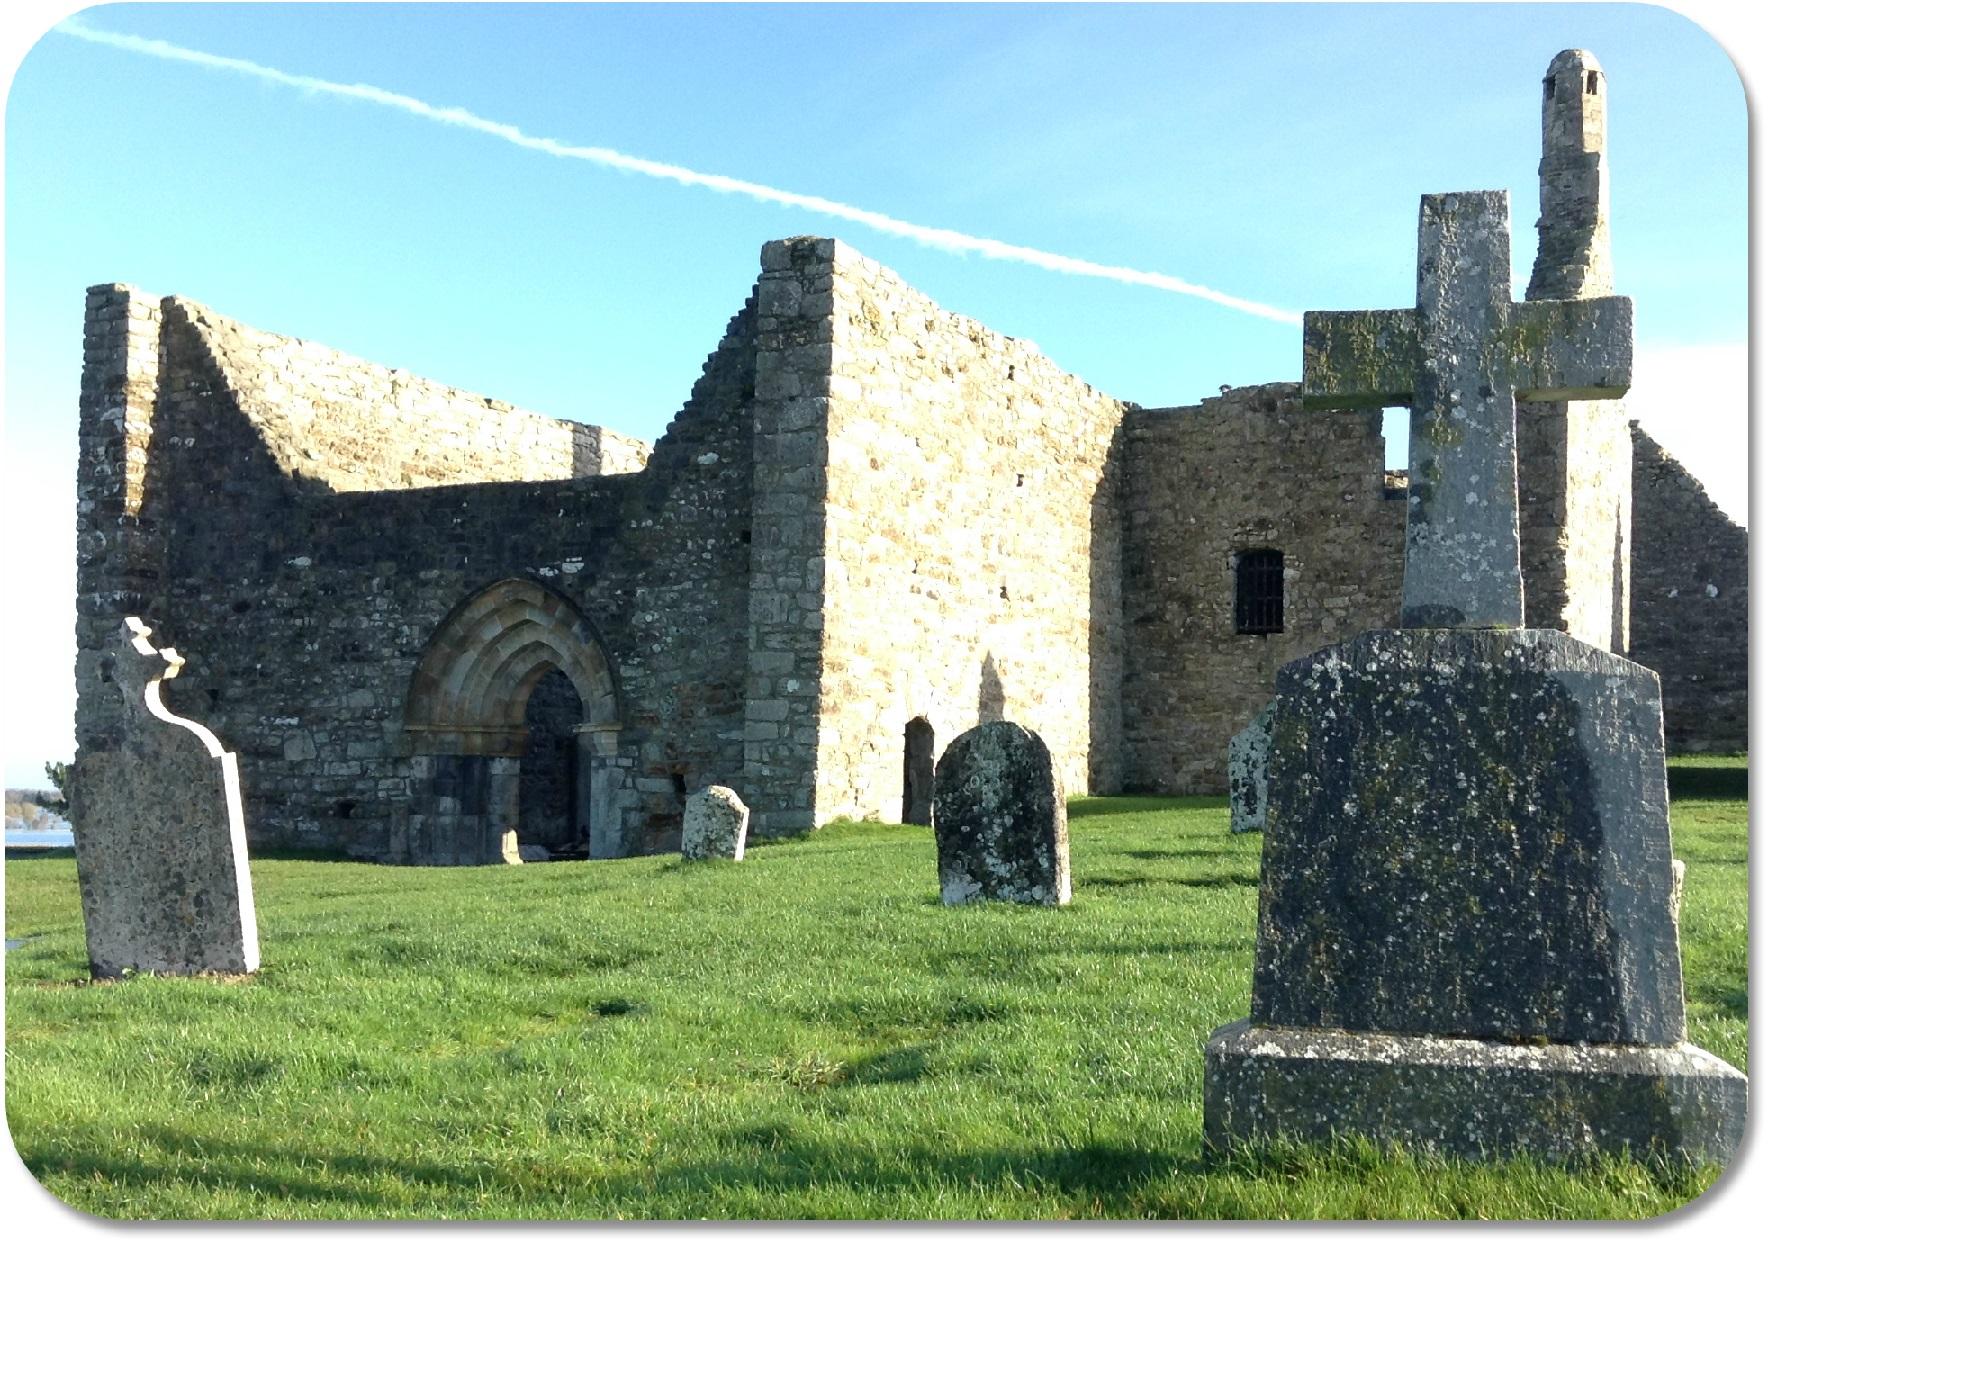 Irish Expressions - Clonmacnoise Monastic Site